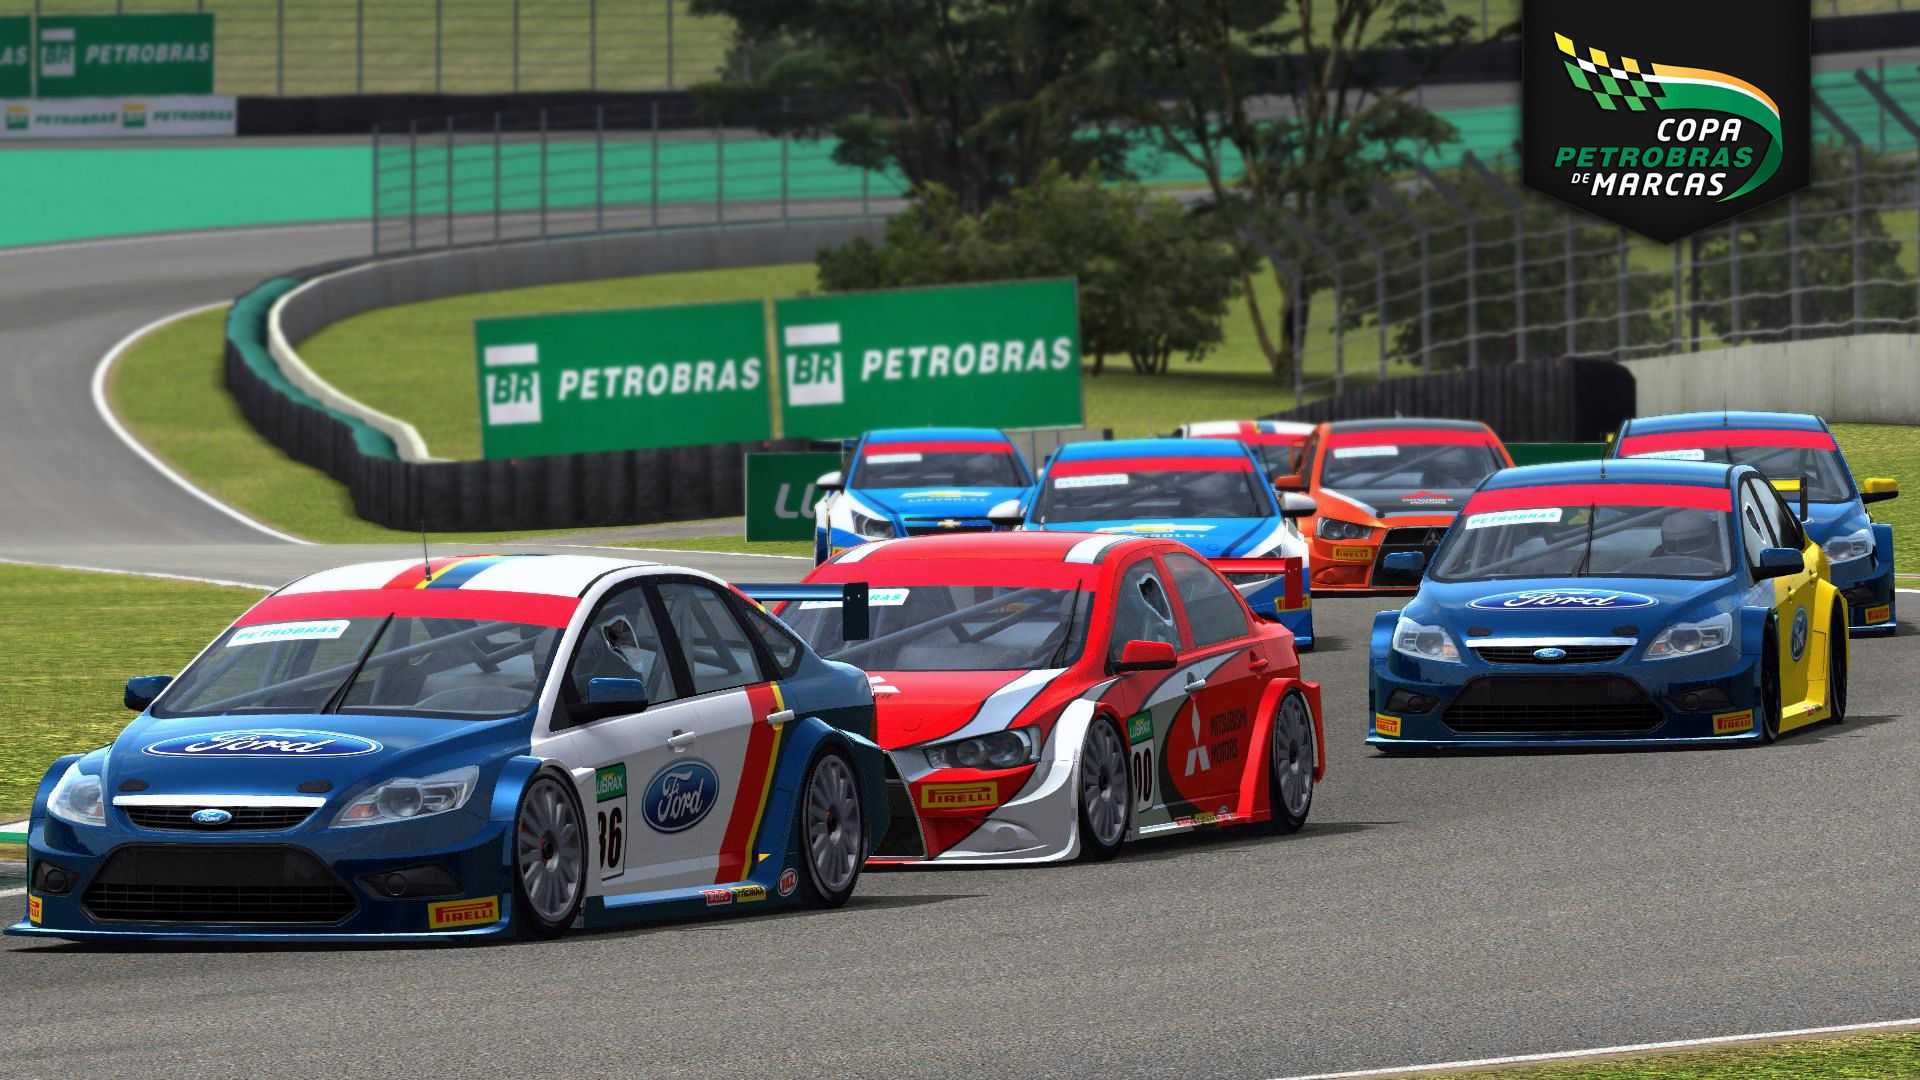 Copa petrobras de marcas racing simulator racing